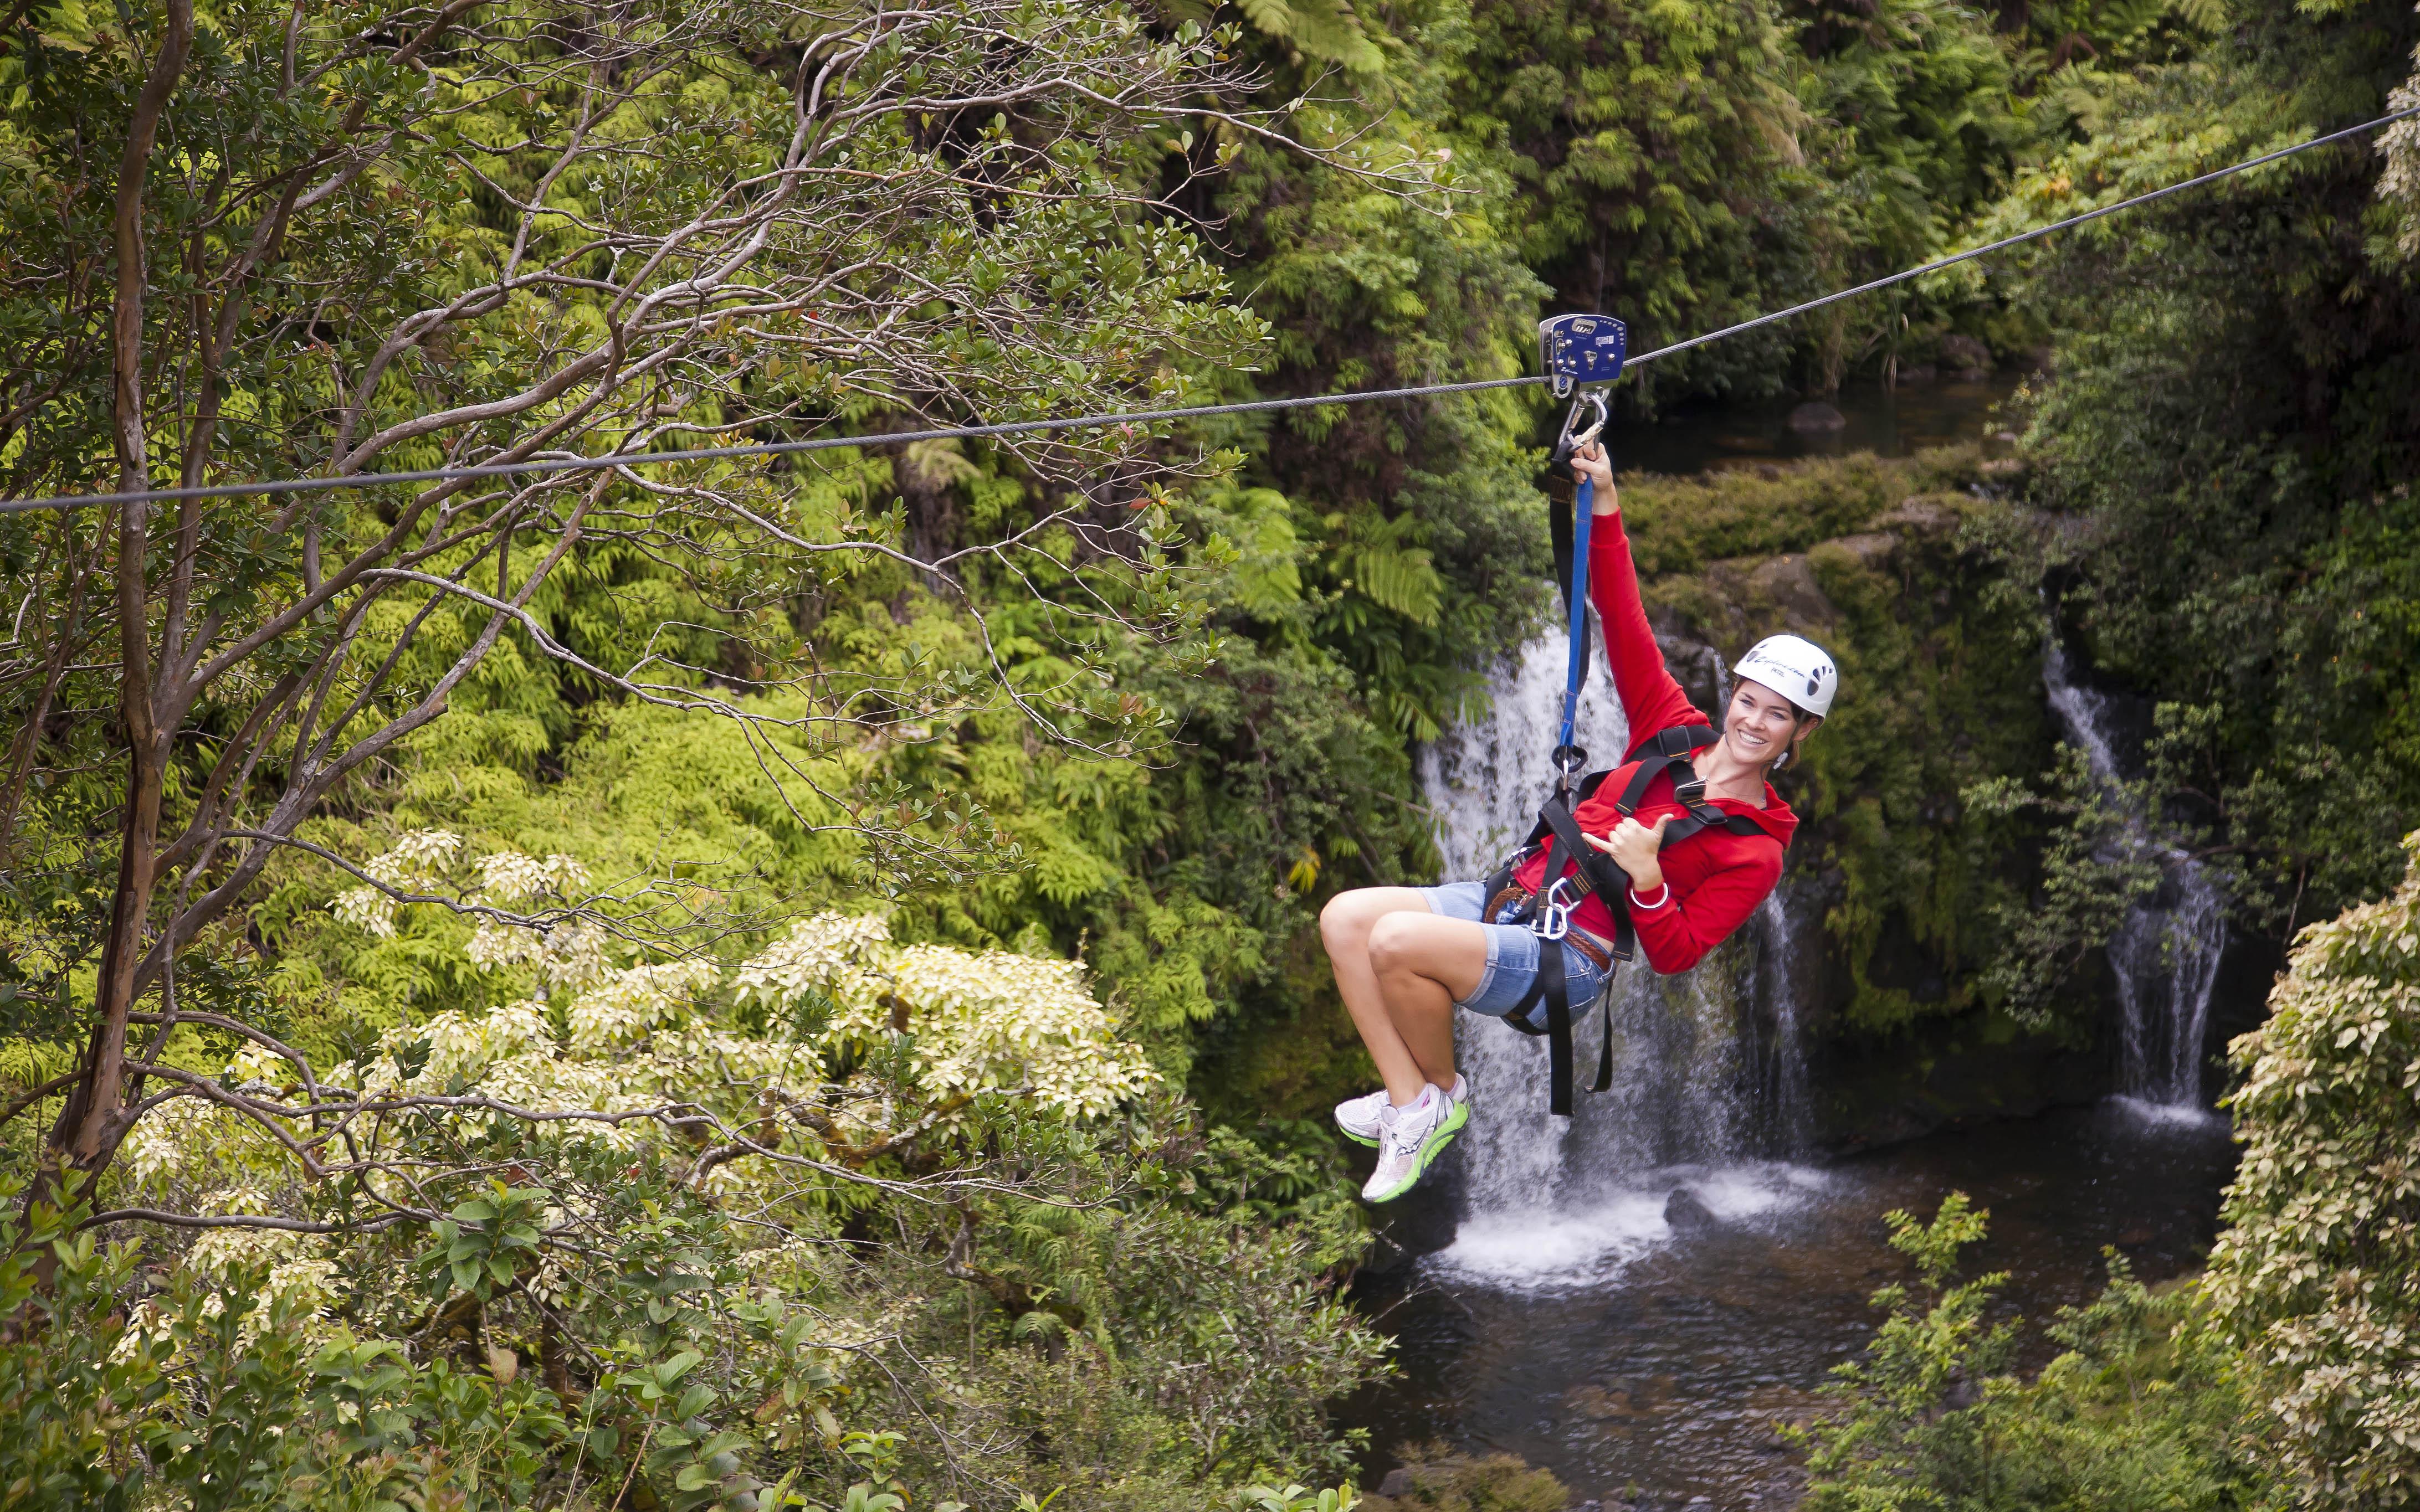 Akaka Falls Zip 'n Dip